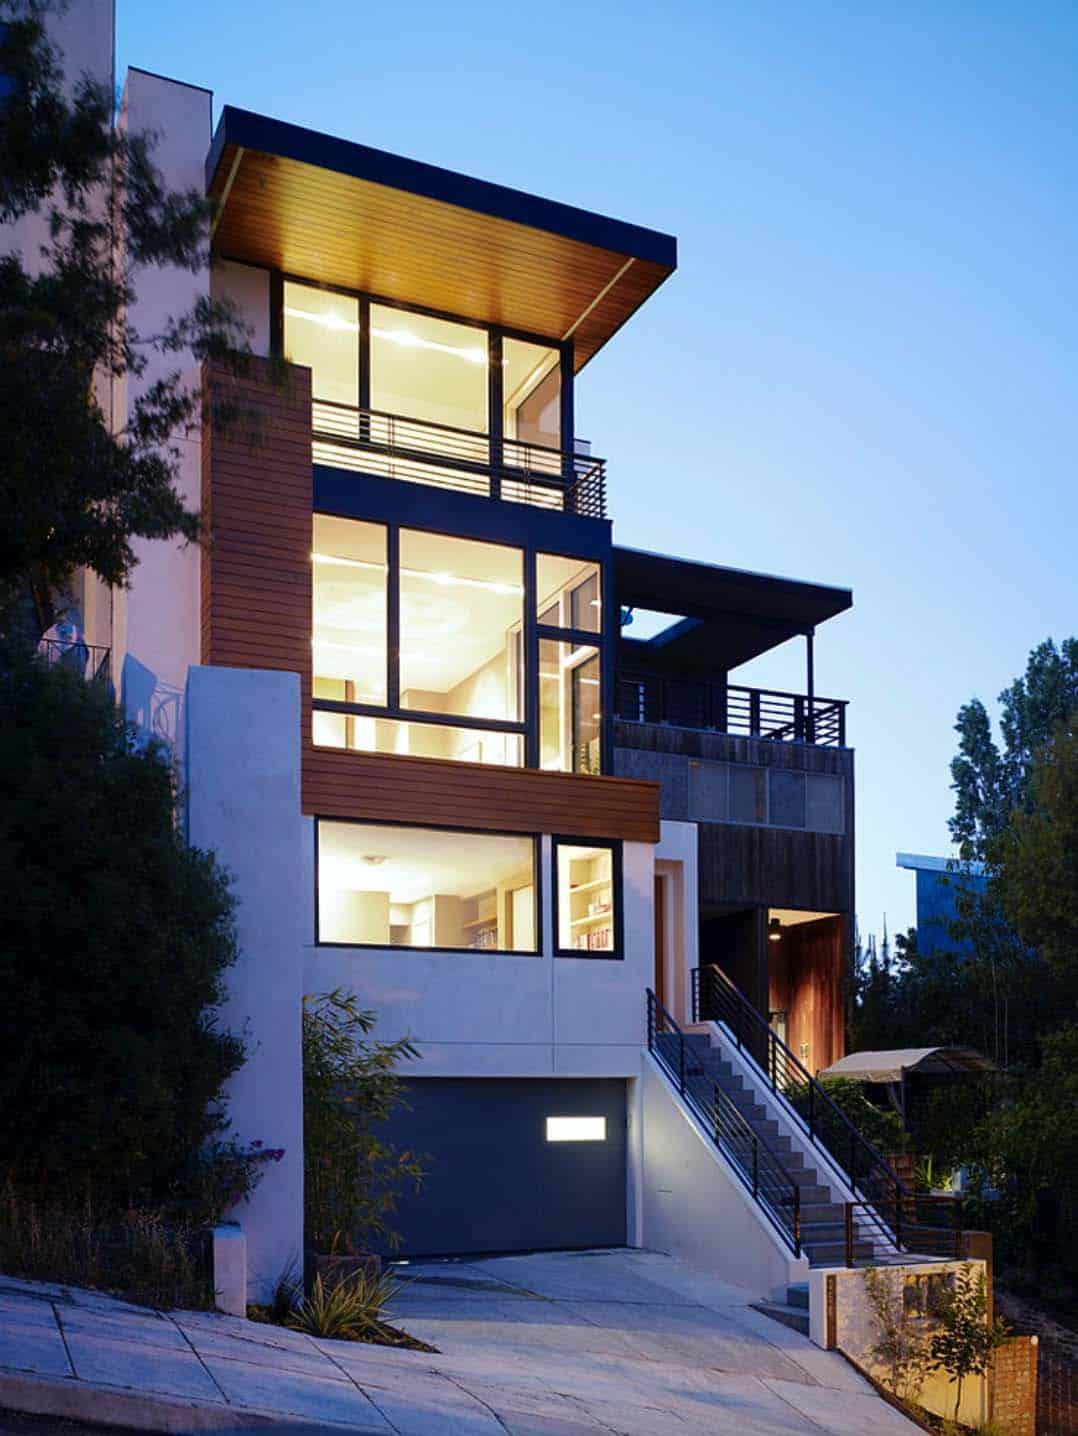 Architecture Modern Hillside Home-28-1 Kindesign